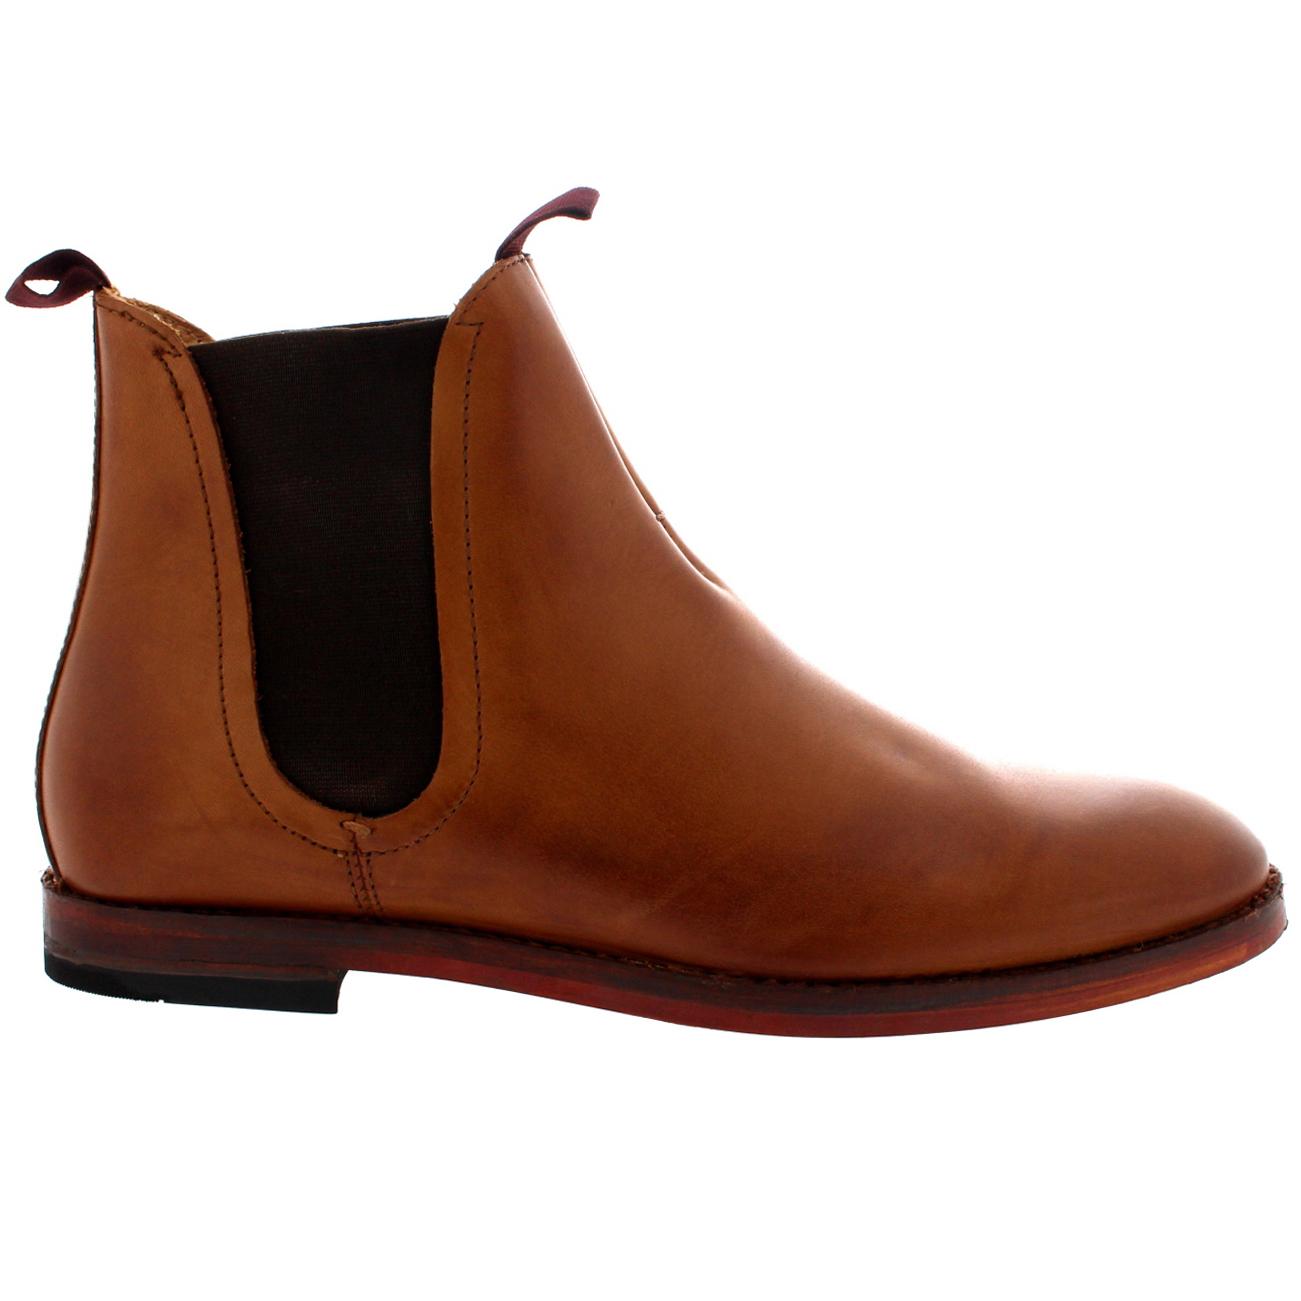 H by Hudson shoes size EU 43 (UK 9 US 10)